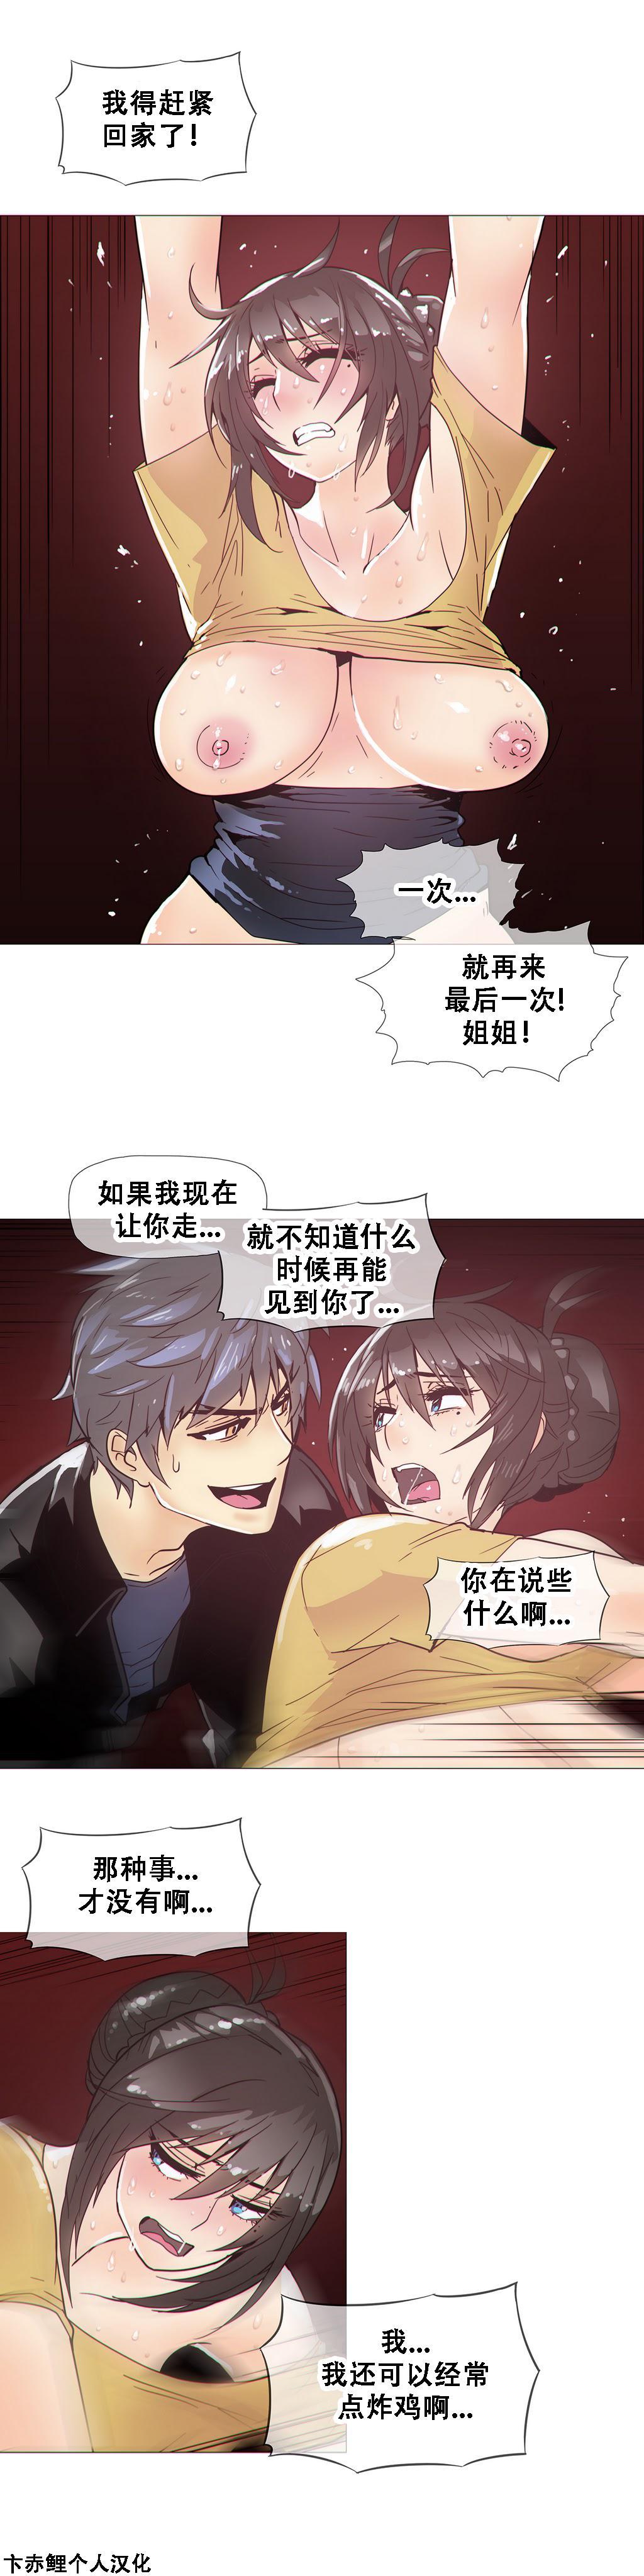 HouseHold Affairs 【卞赤鲤个人汉化】1~21话(持续更新中) 341